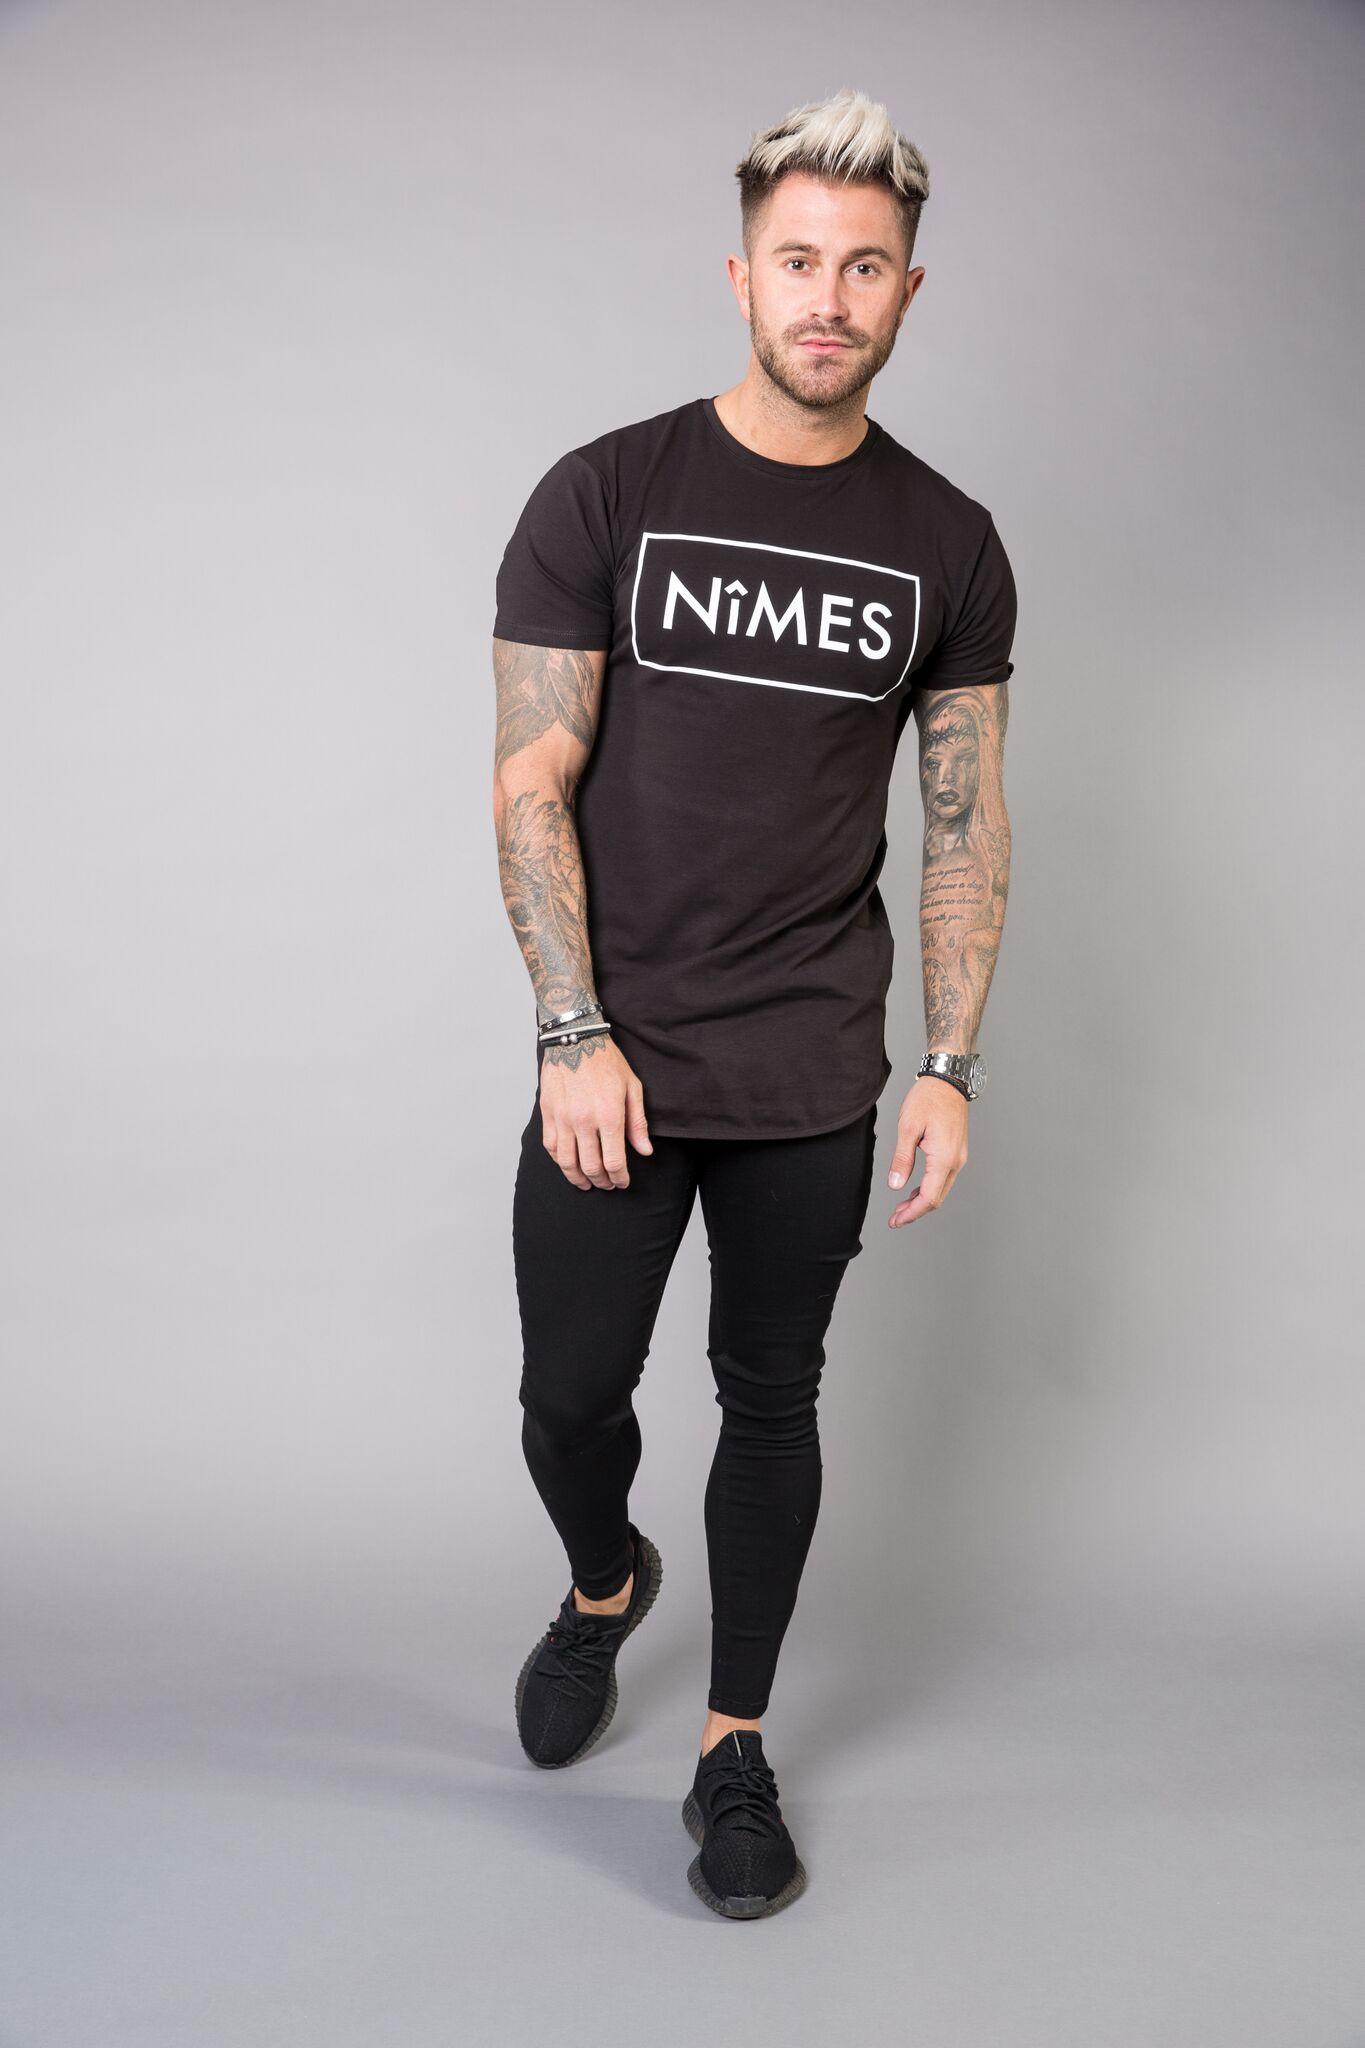 Gay guys in skinny jeans